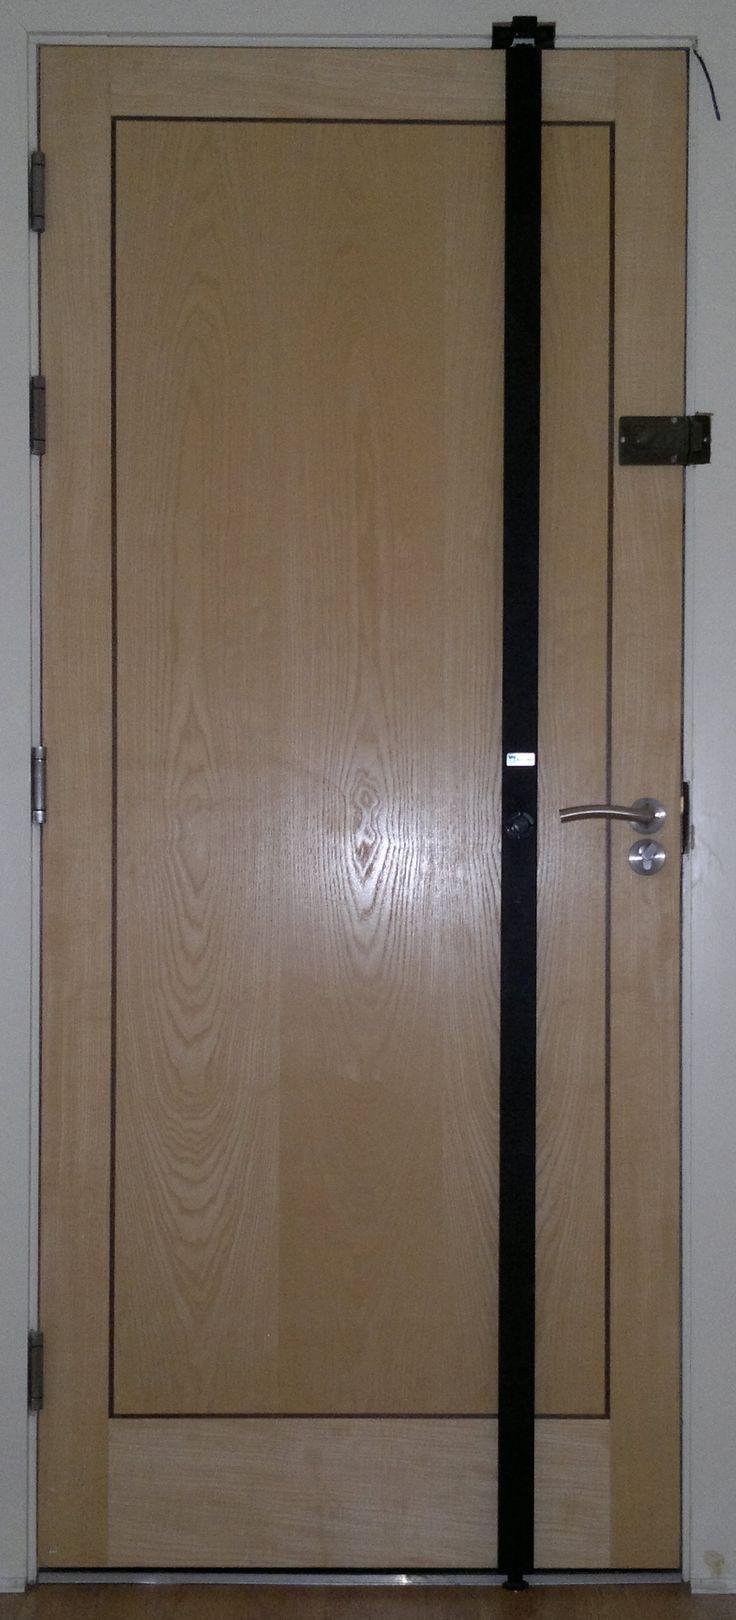 Apartment Door Security Bar